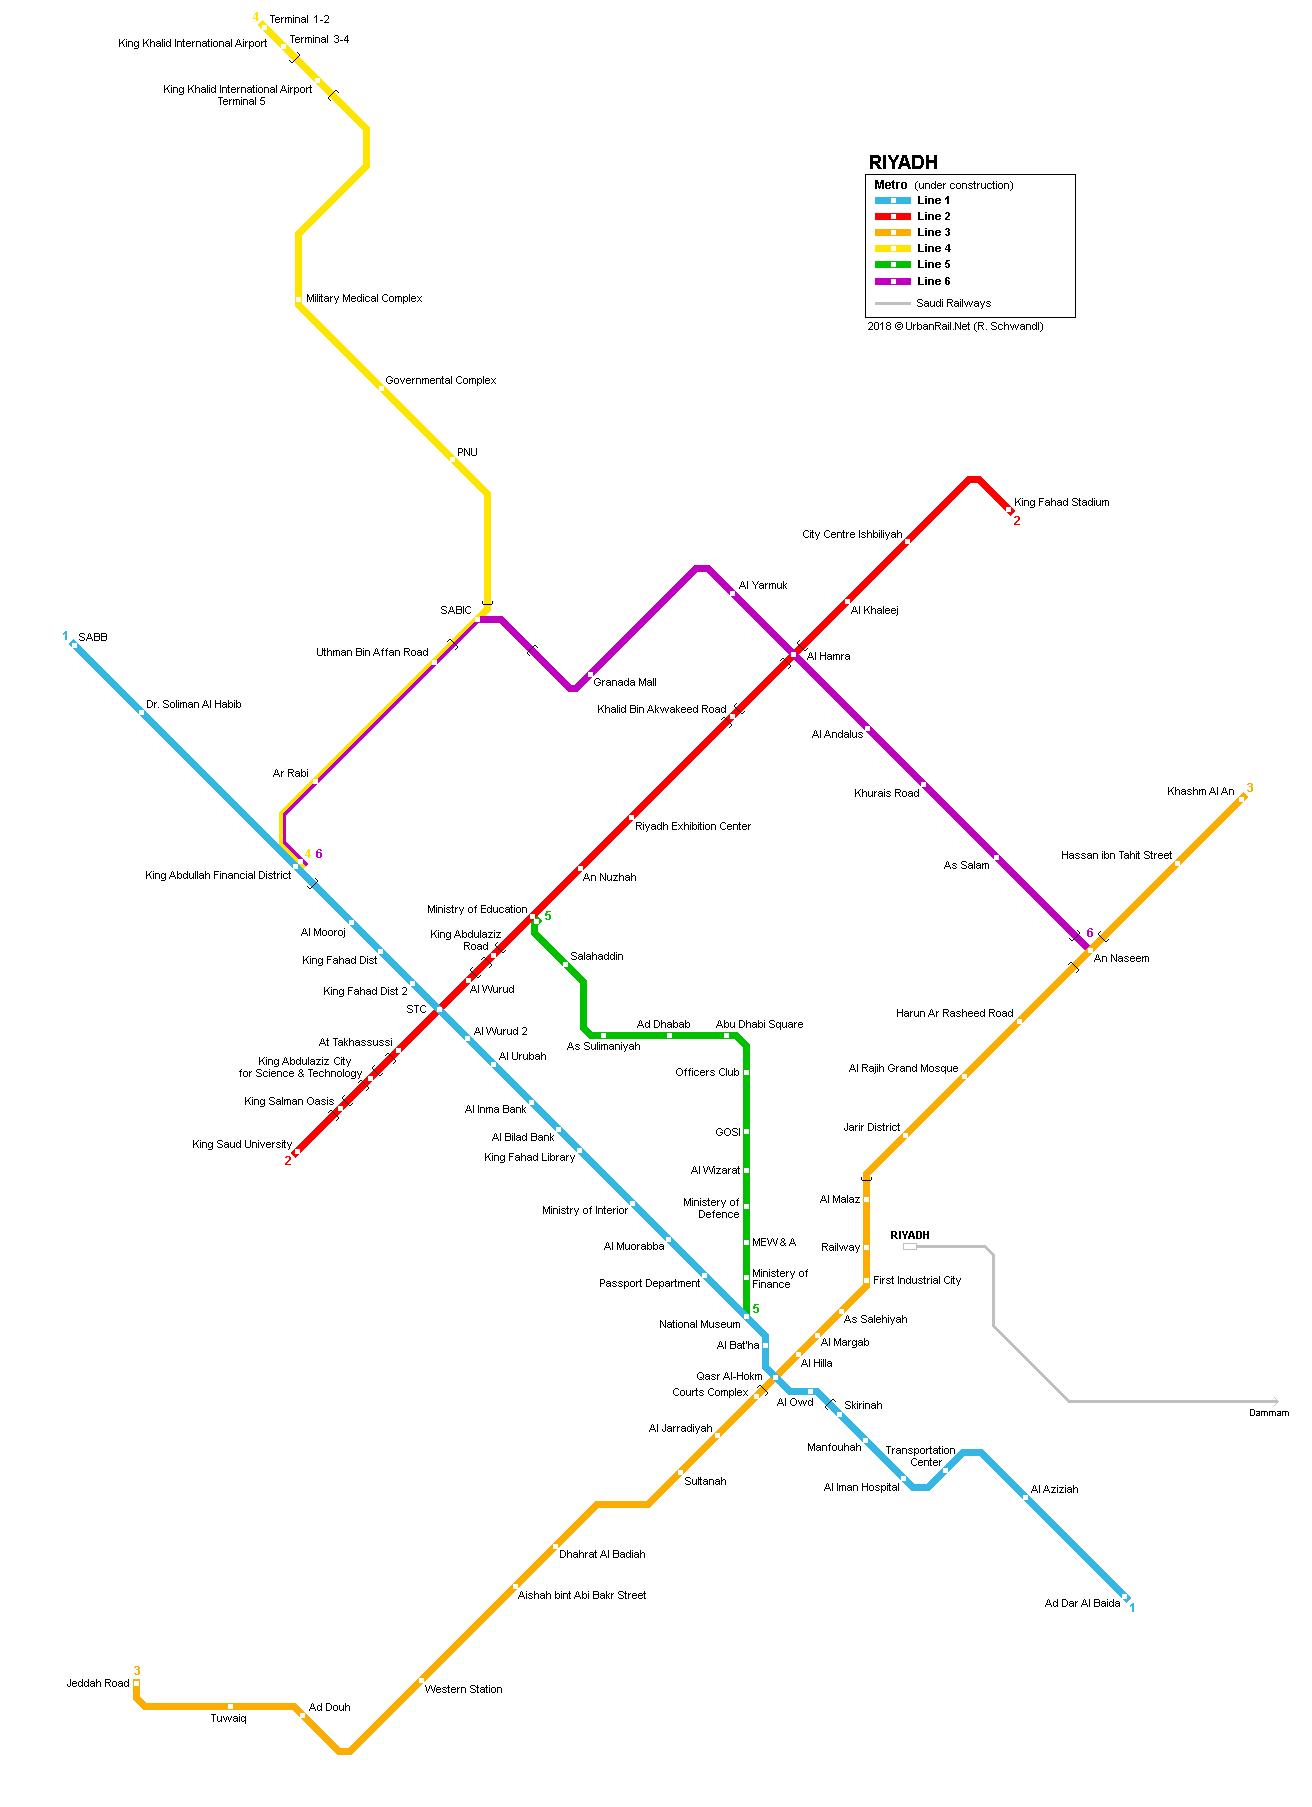 UrbanRail Net > Asia > Saudi Arabia > Riyadh Metro